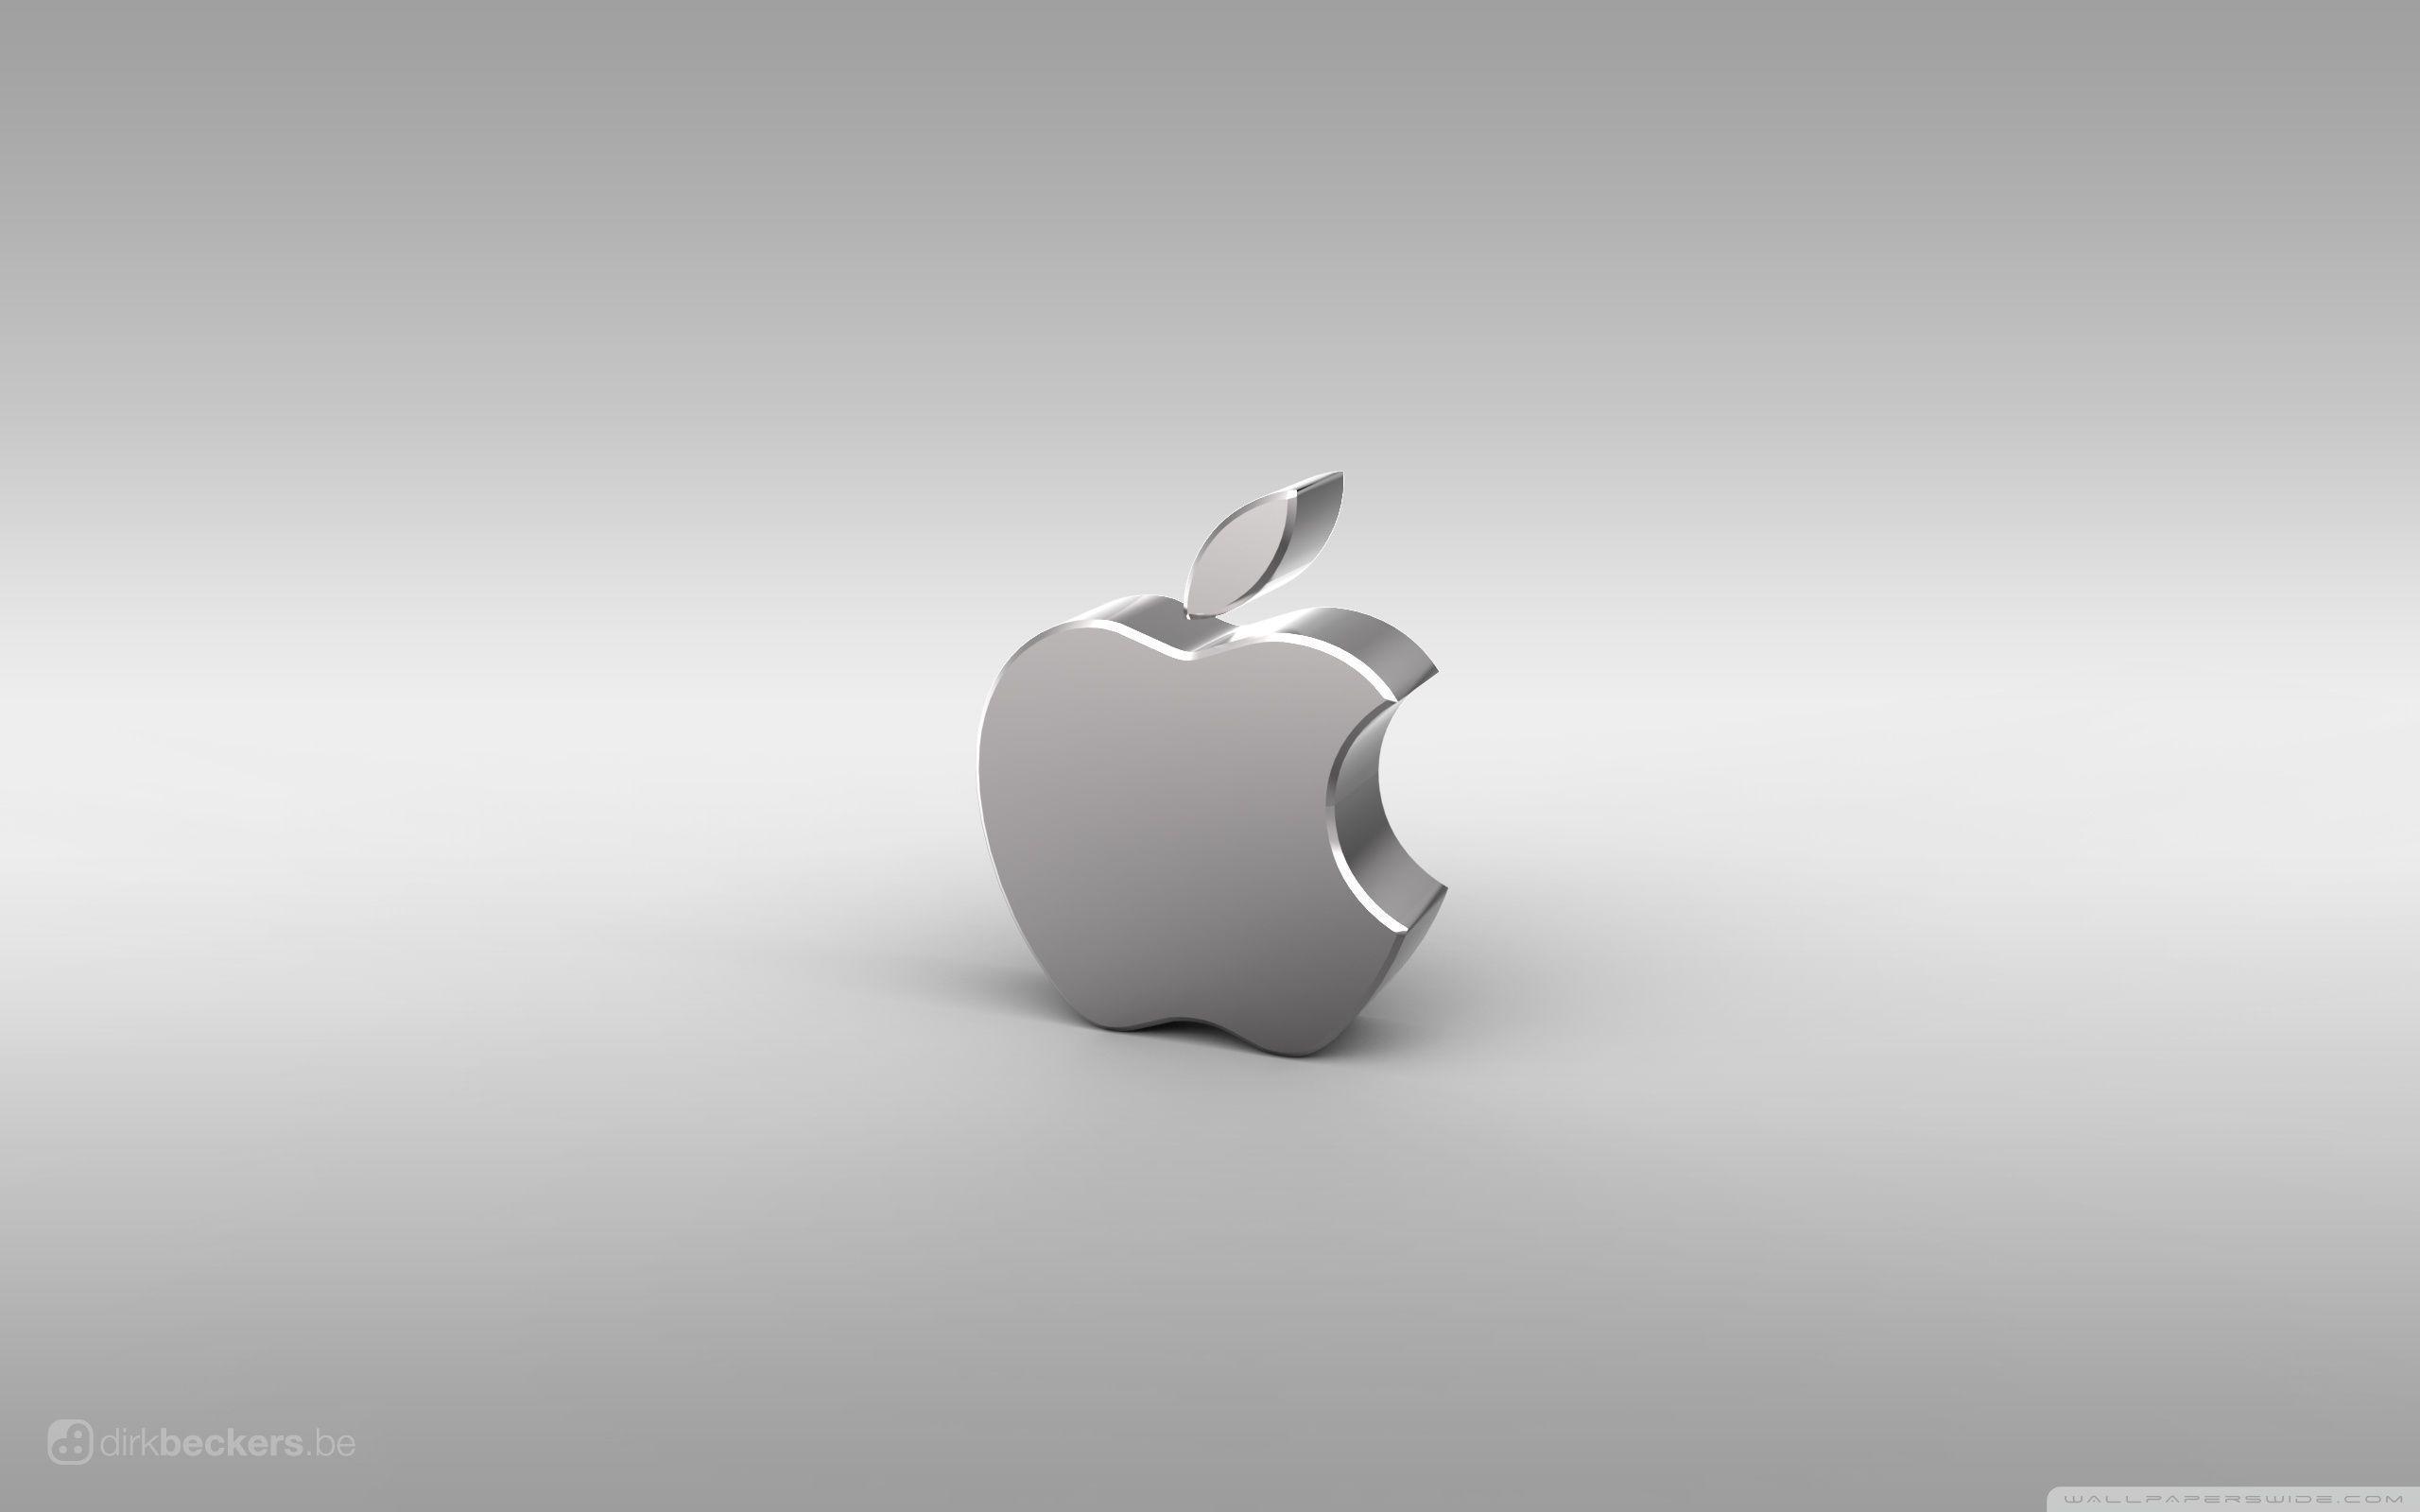 apple logo hd wallpapers wallpaper